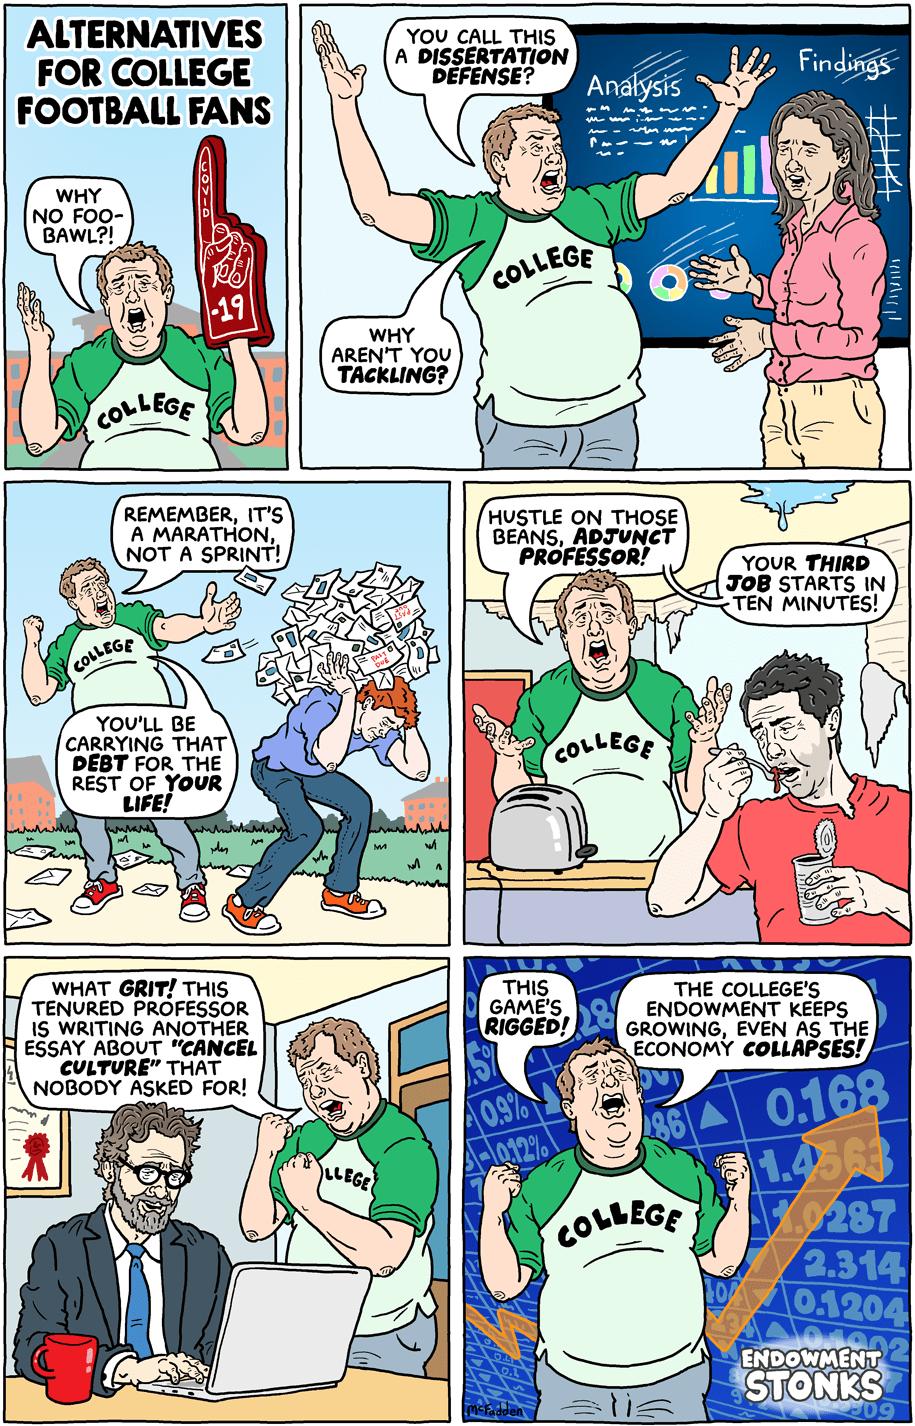 Cartoon: Alternatives for college football fans